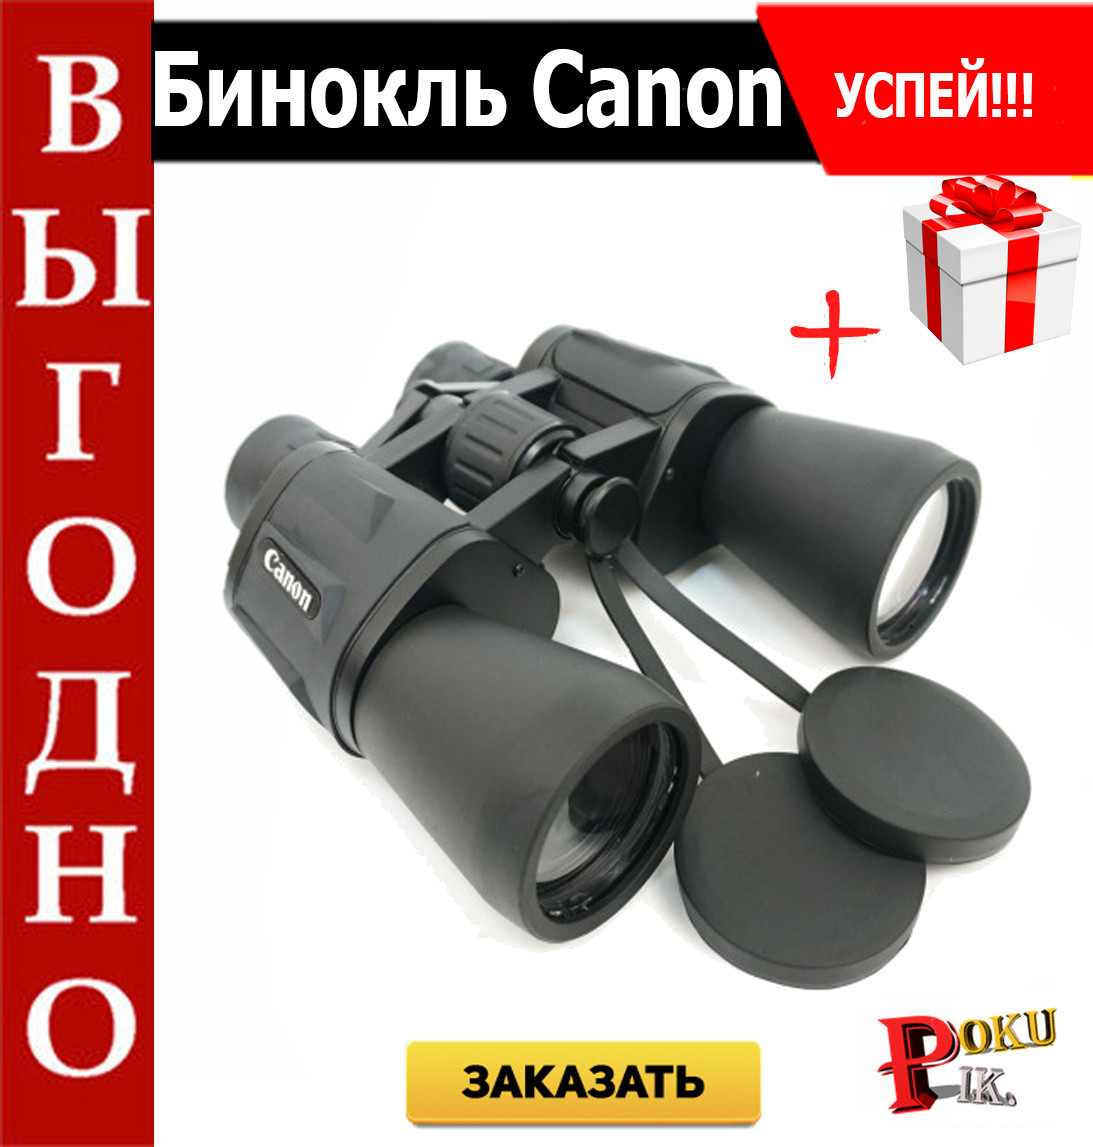 Бинокль в стиле Canon